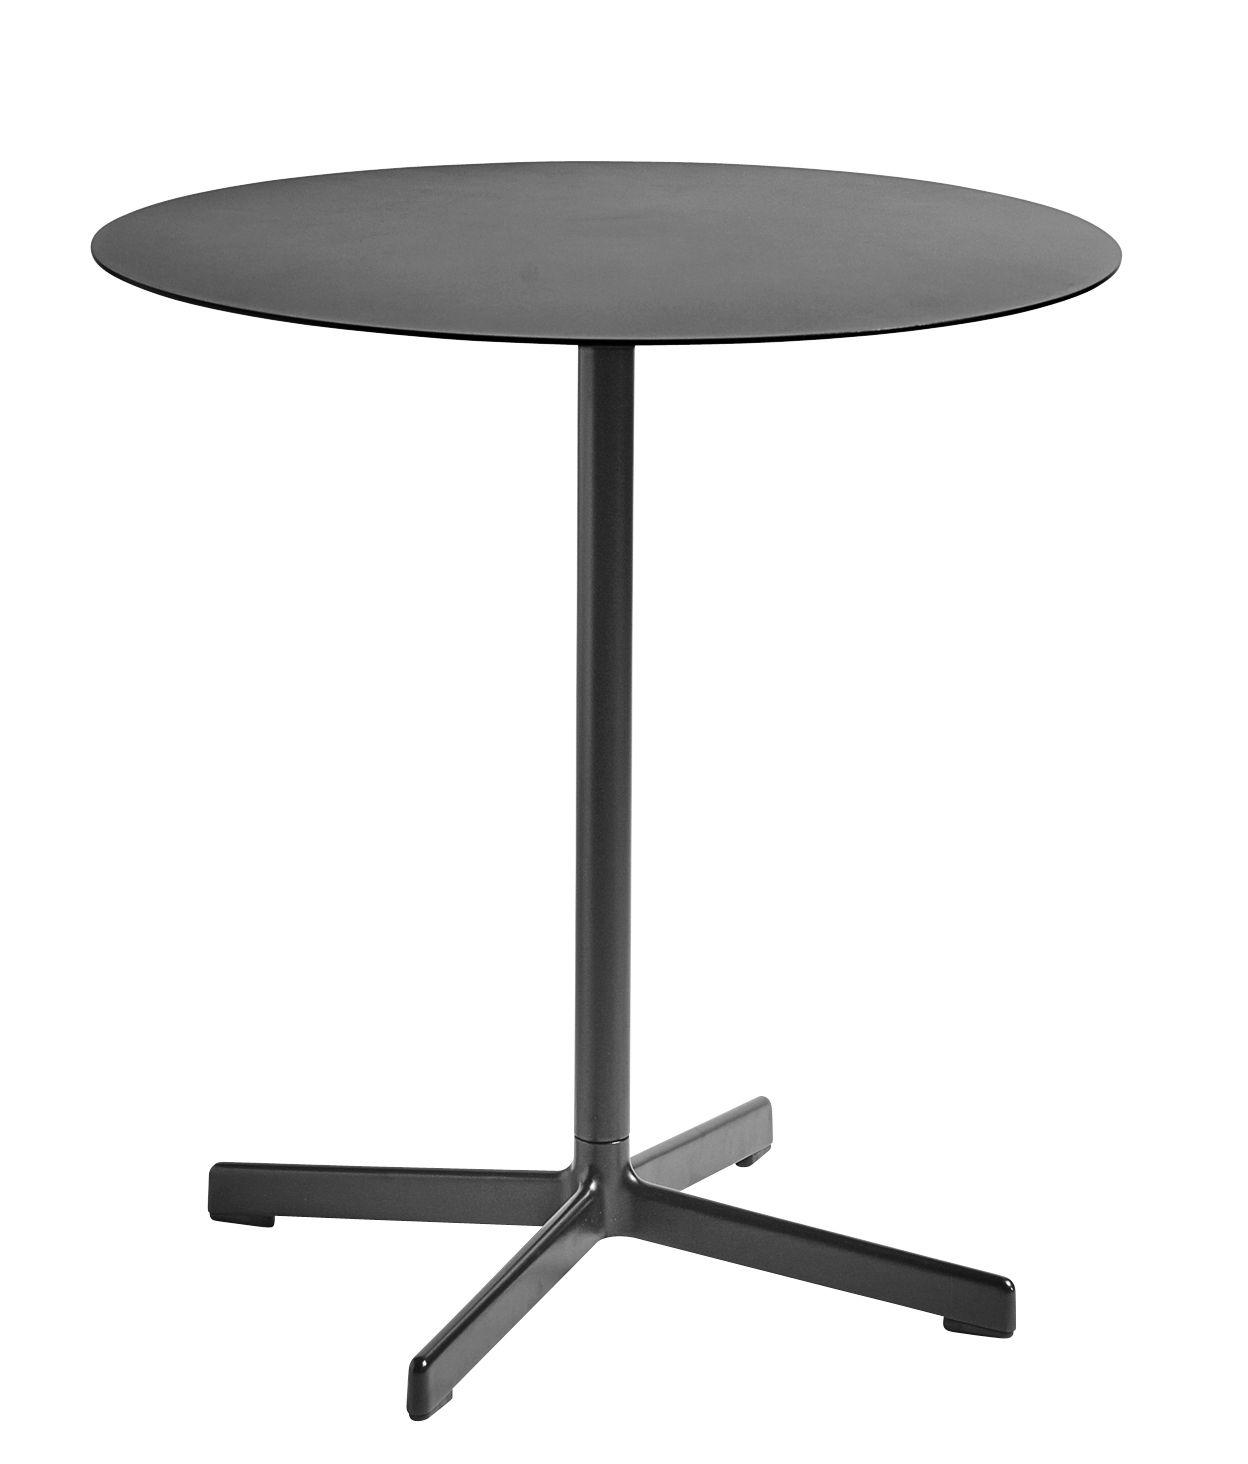 neu 70 cm metall hay tisch. Black Bedroom Furniture Sets. Home Design Ideas